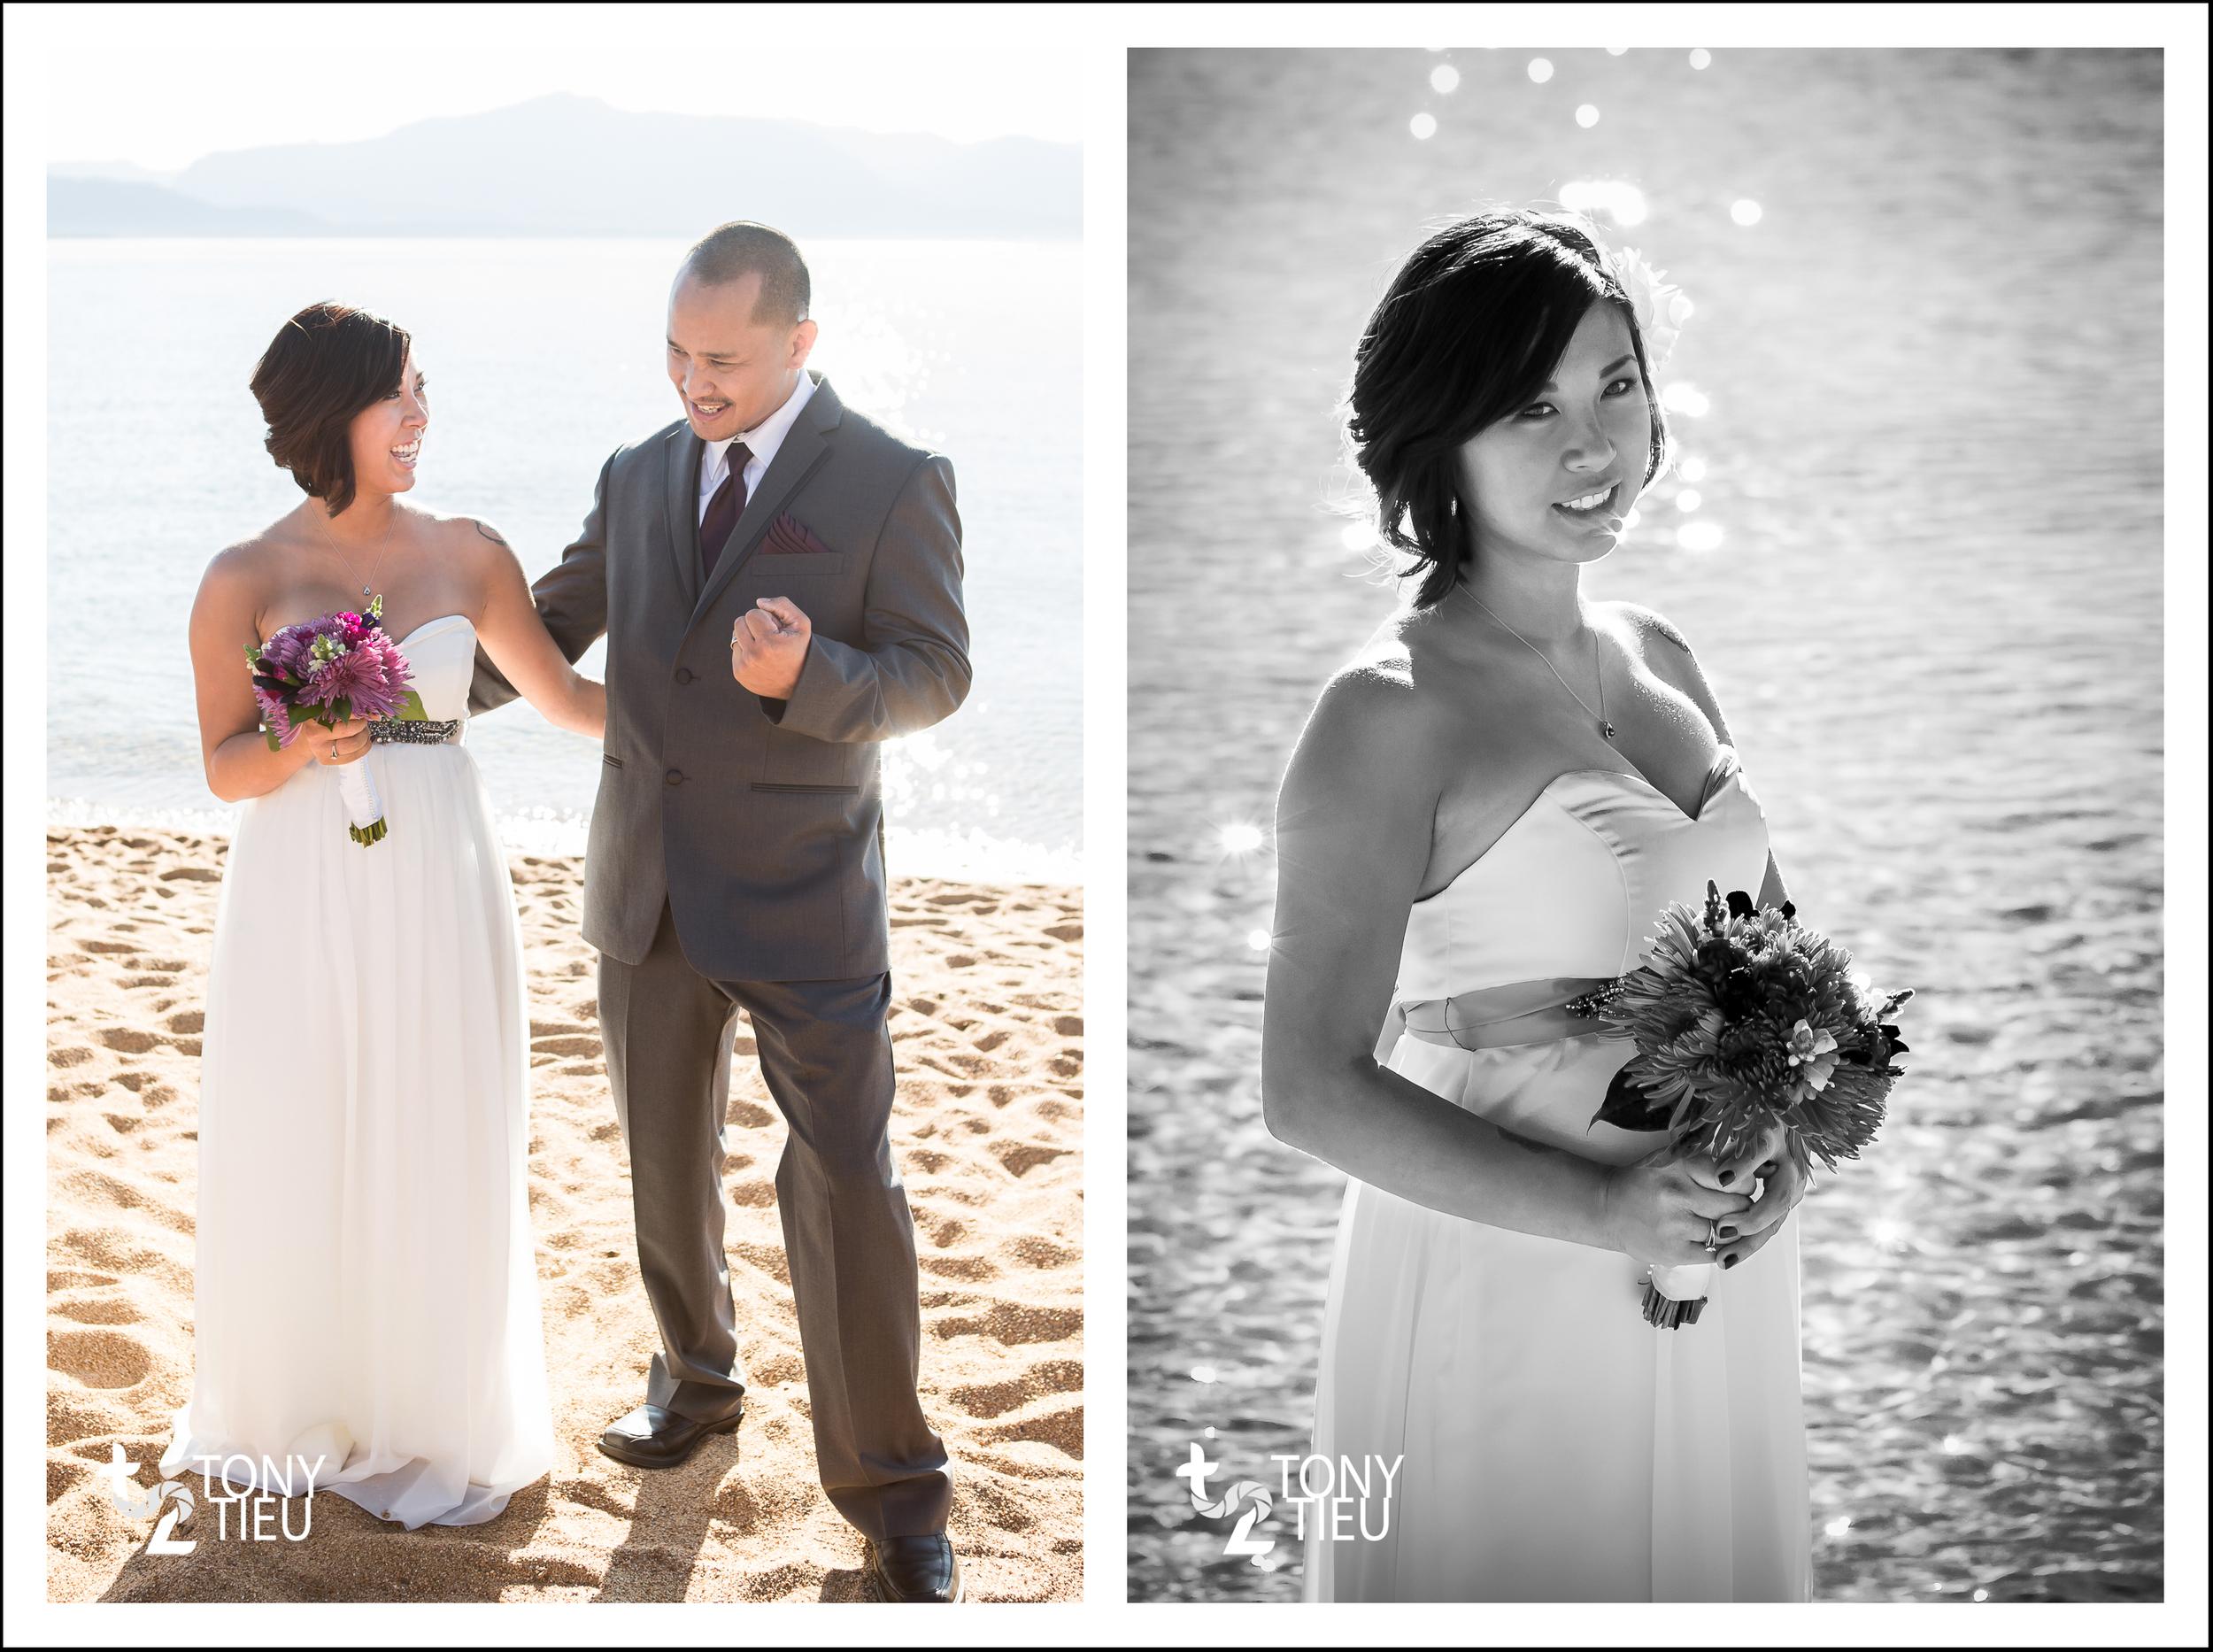 Tony_Tieu_Alyssa_ Wedding_3